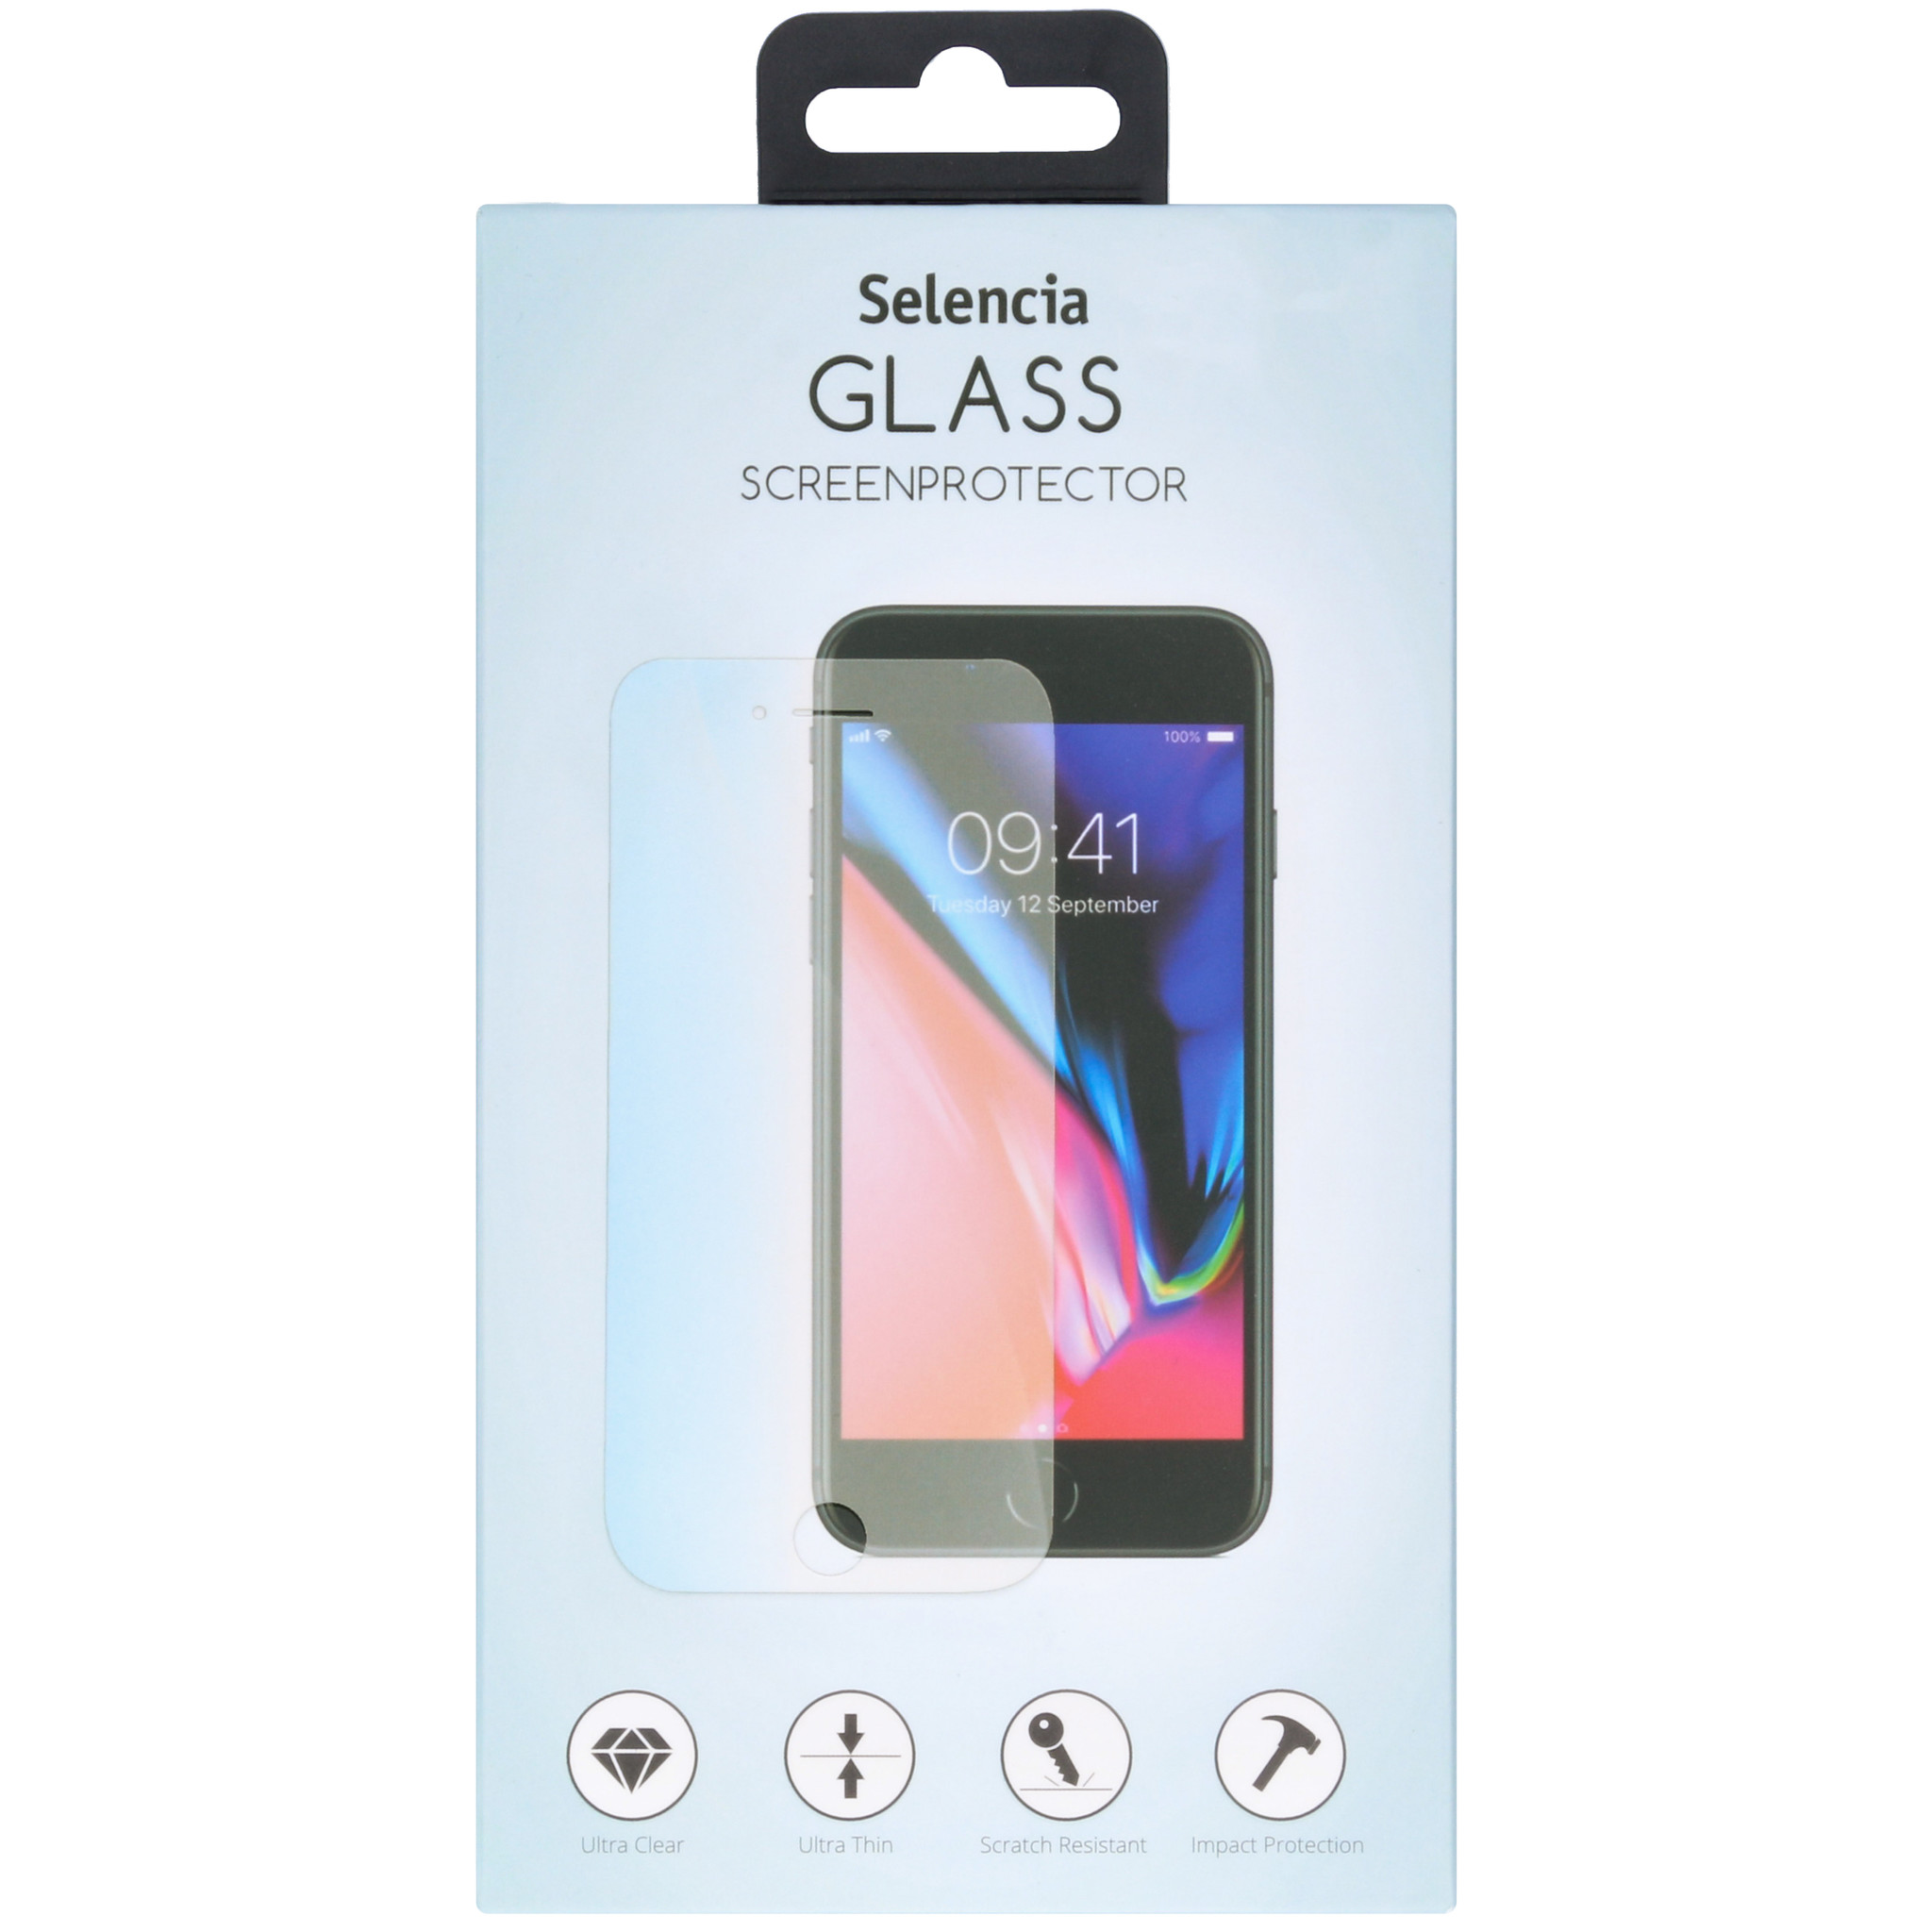 Selencia Gehard Glas Screenprotector Motorola Moto G5S Plus